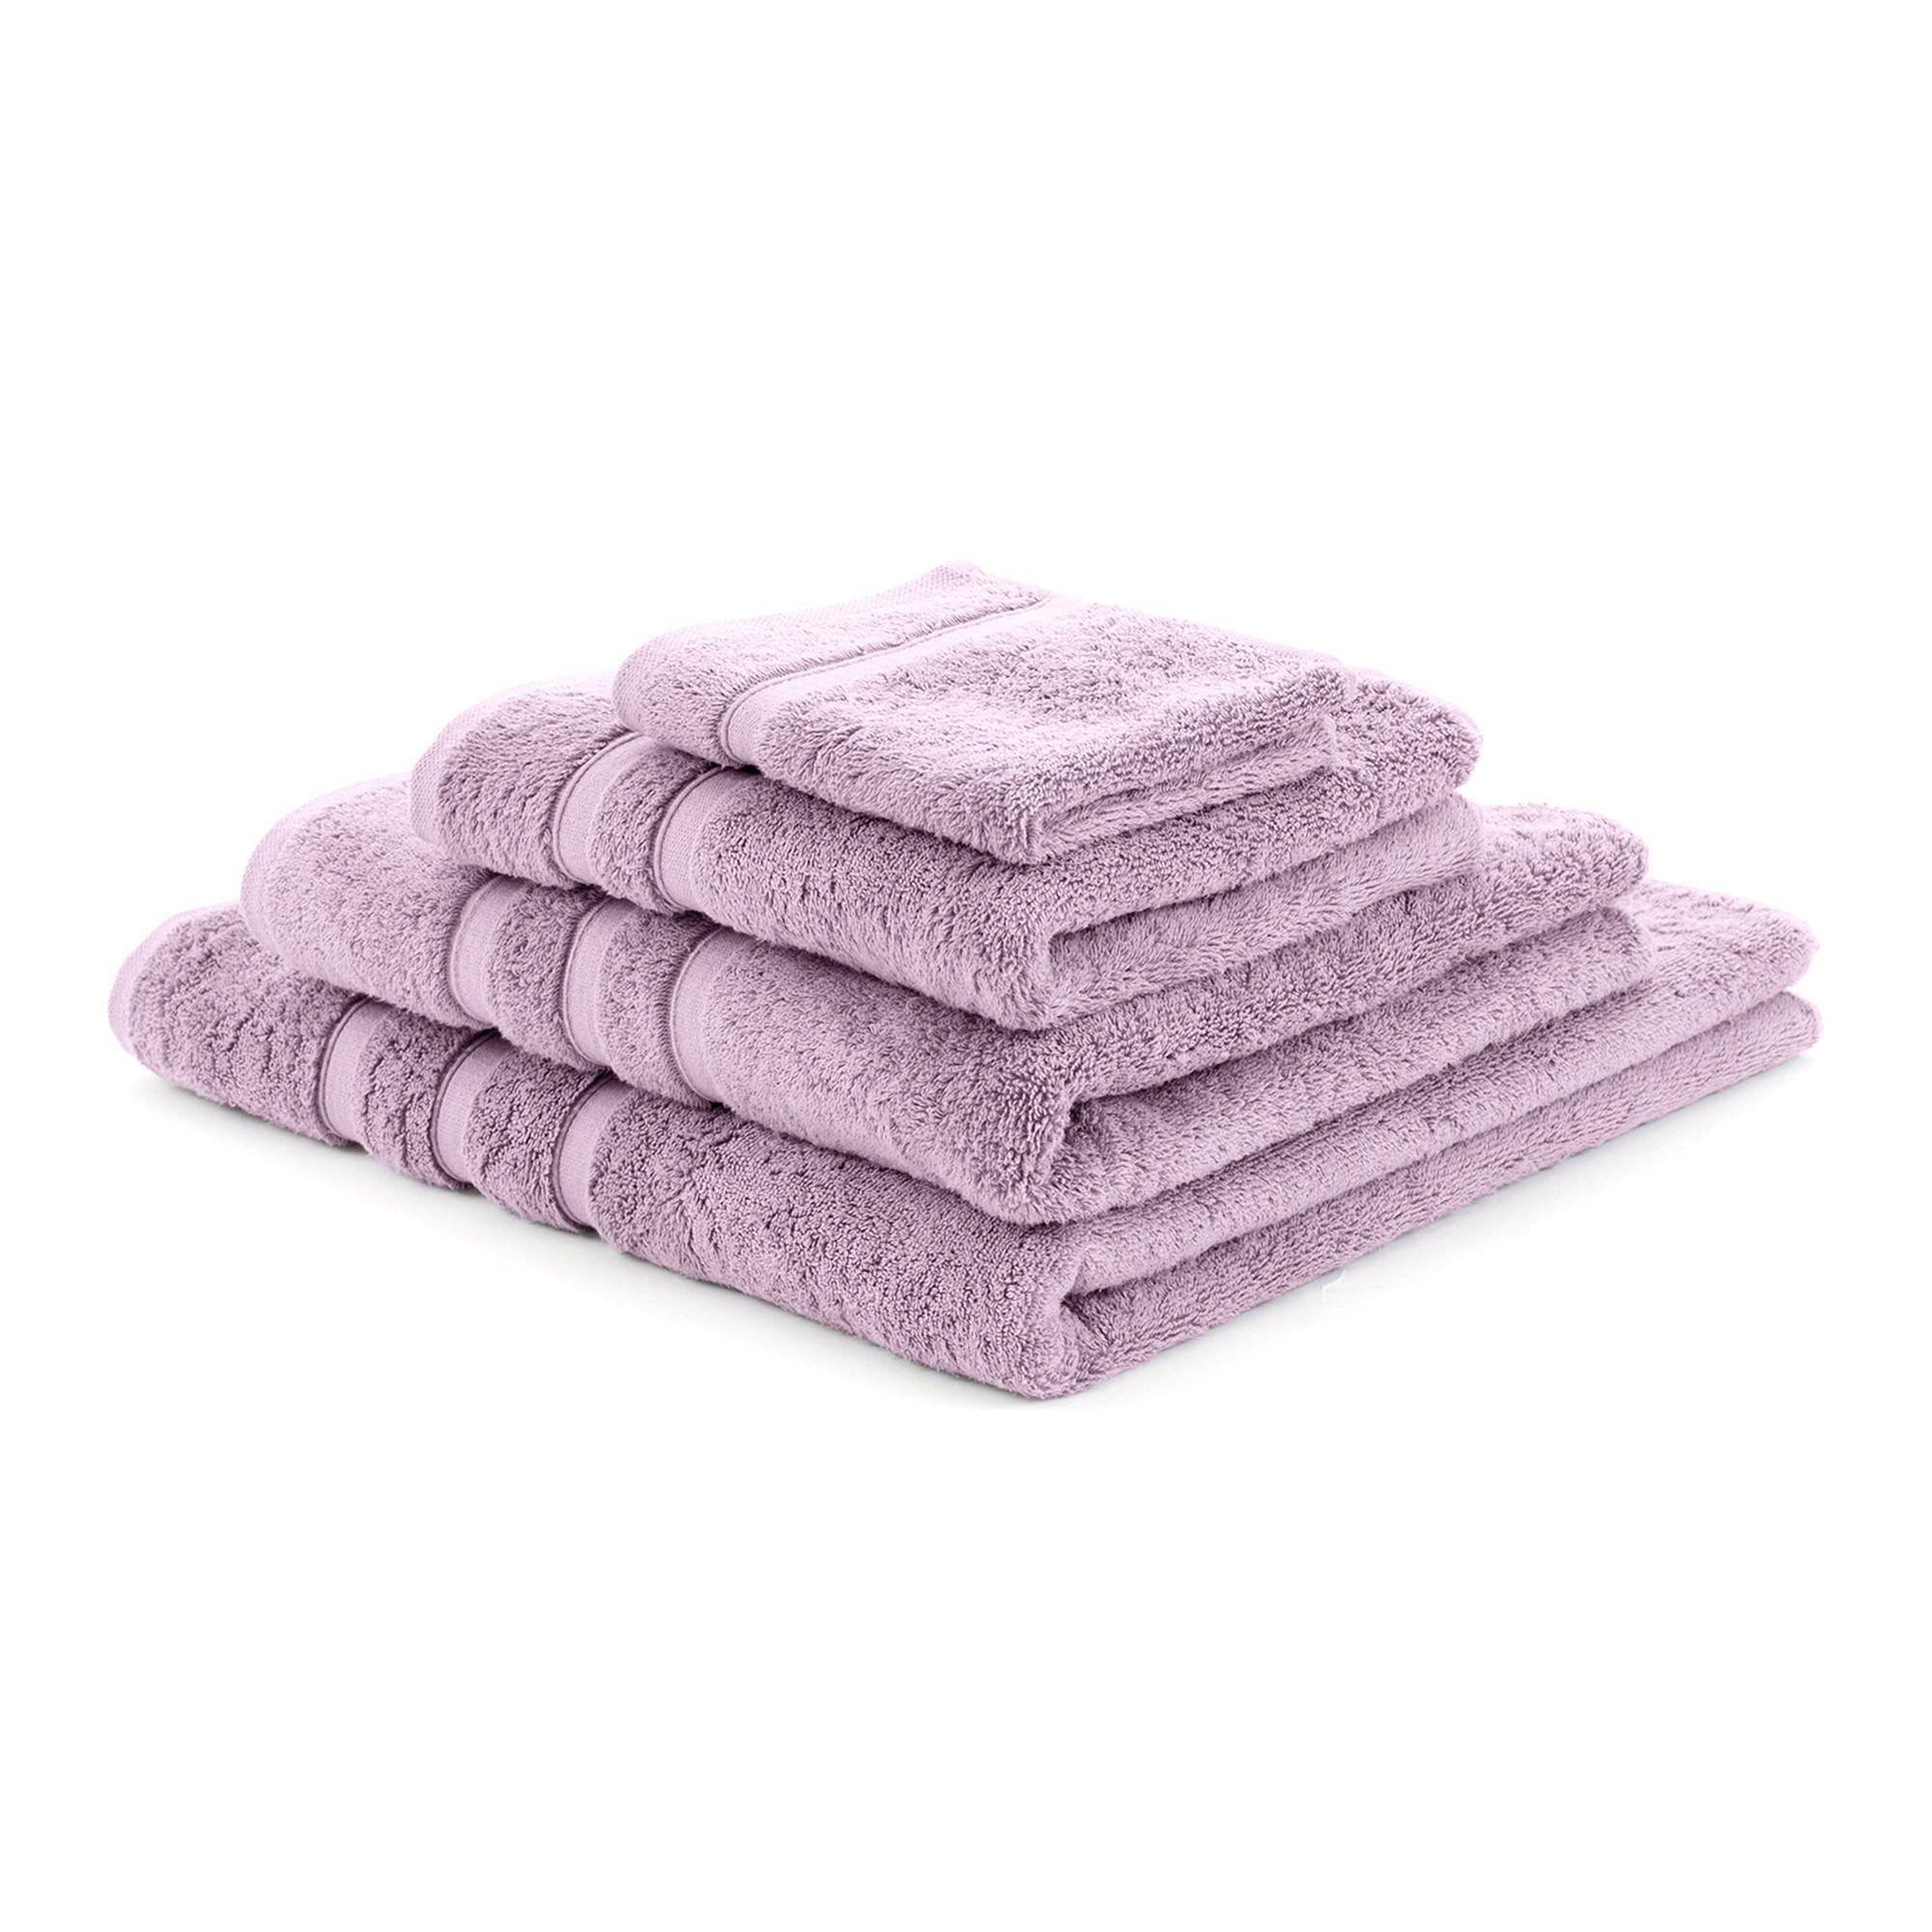 Photo of Hotel wisteria pima towel lavender